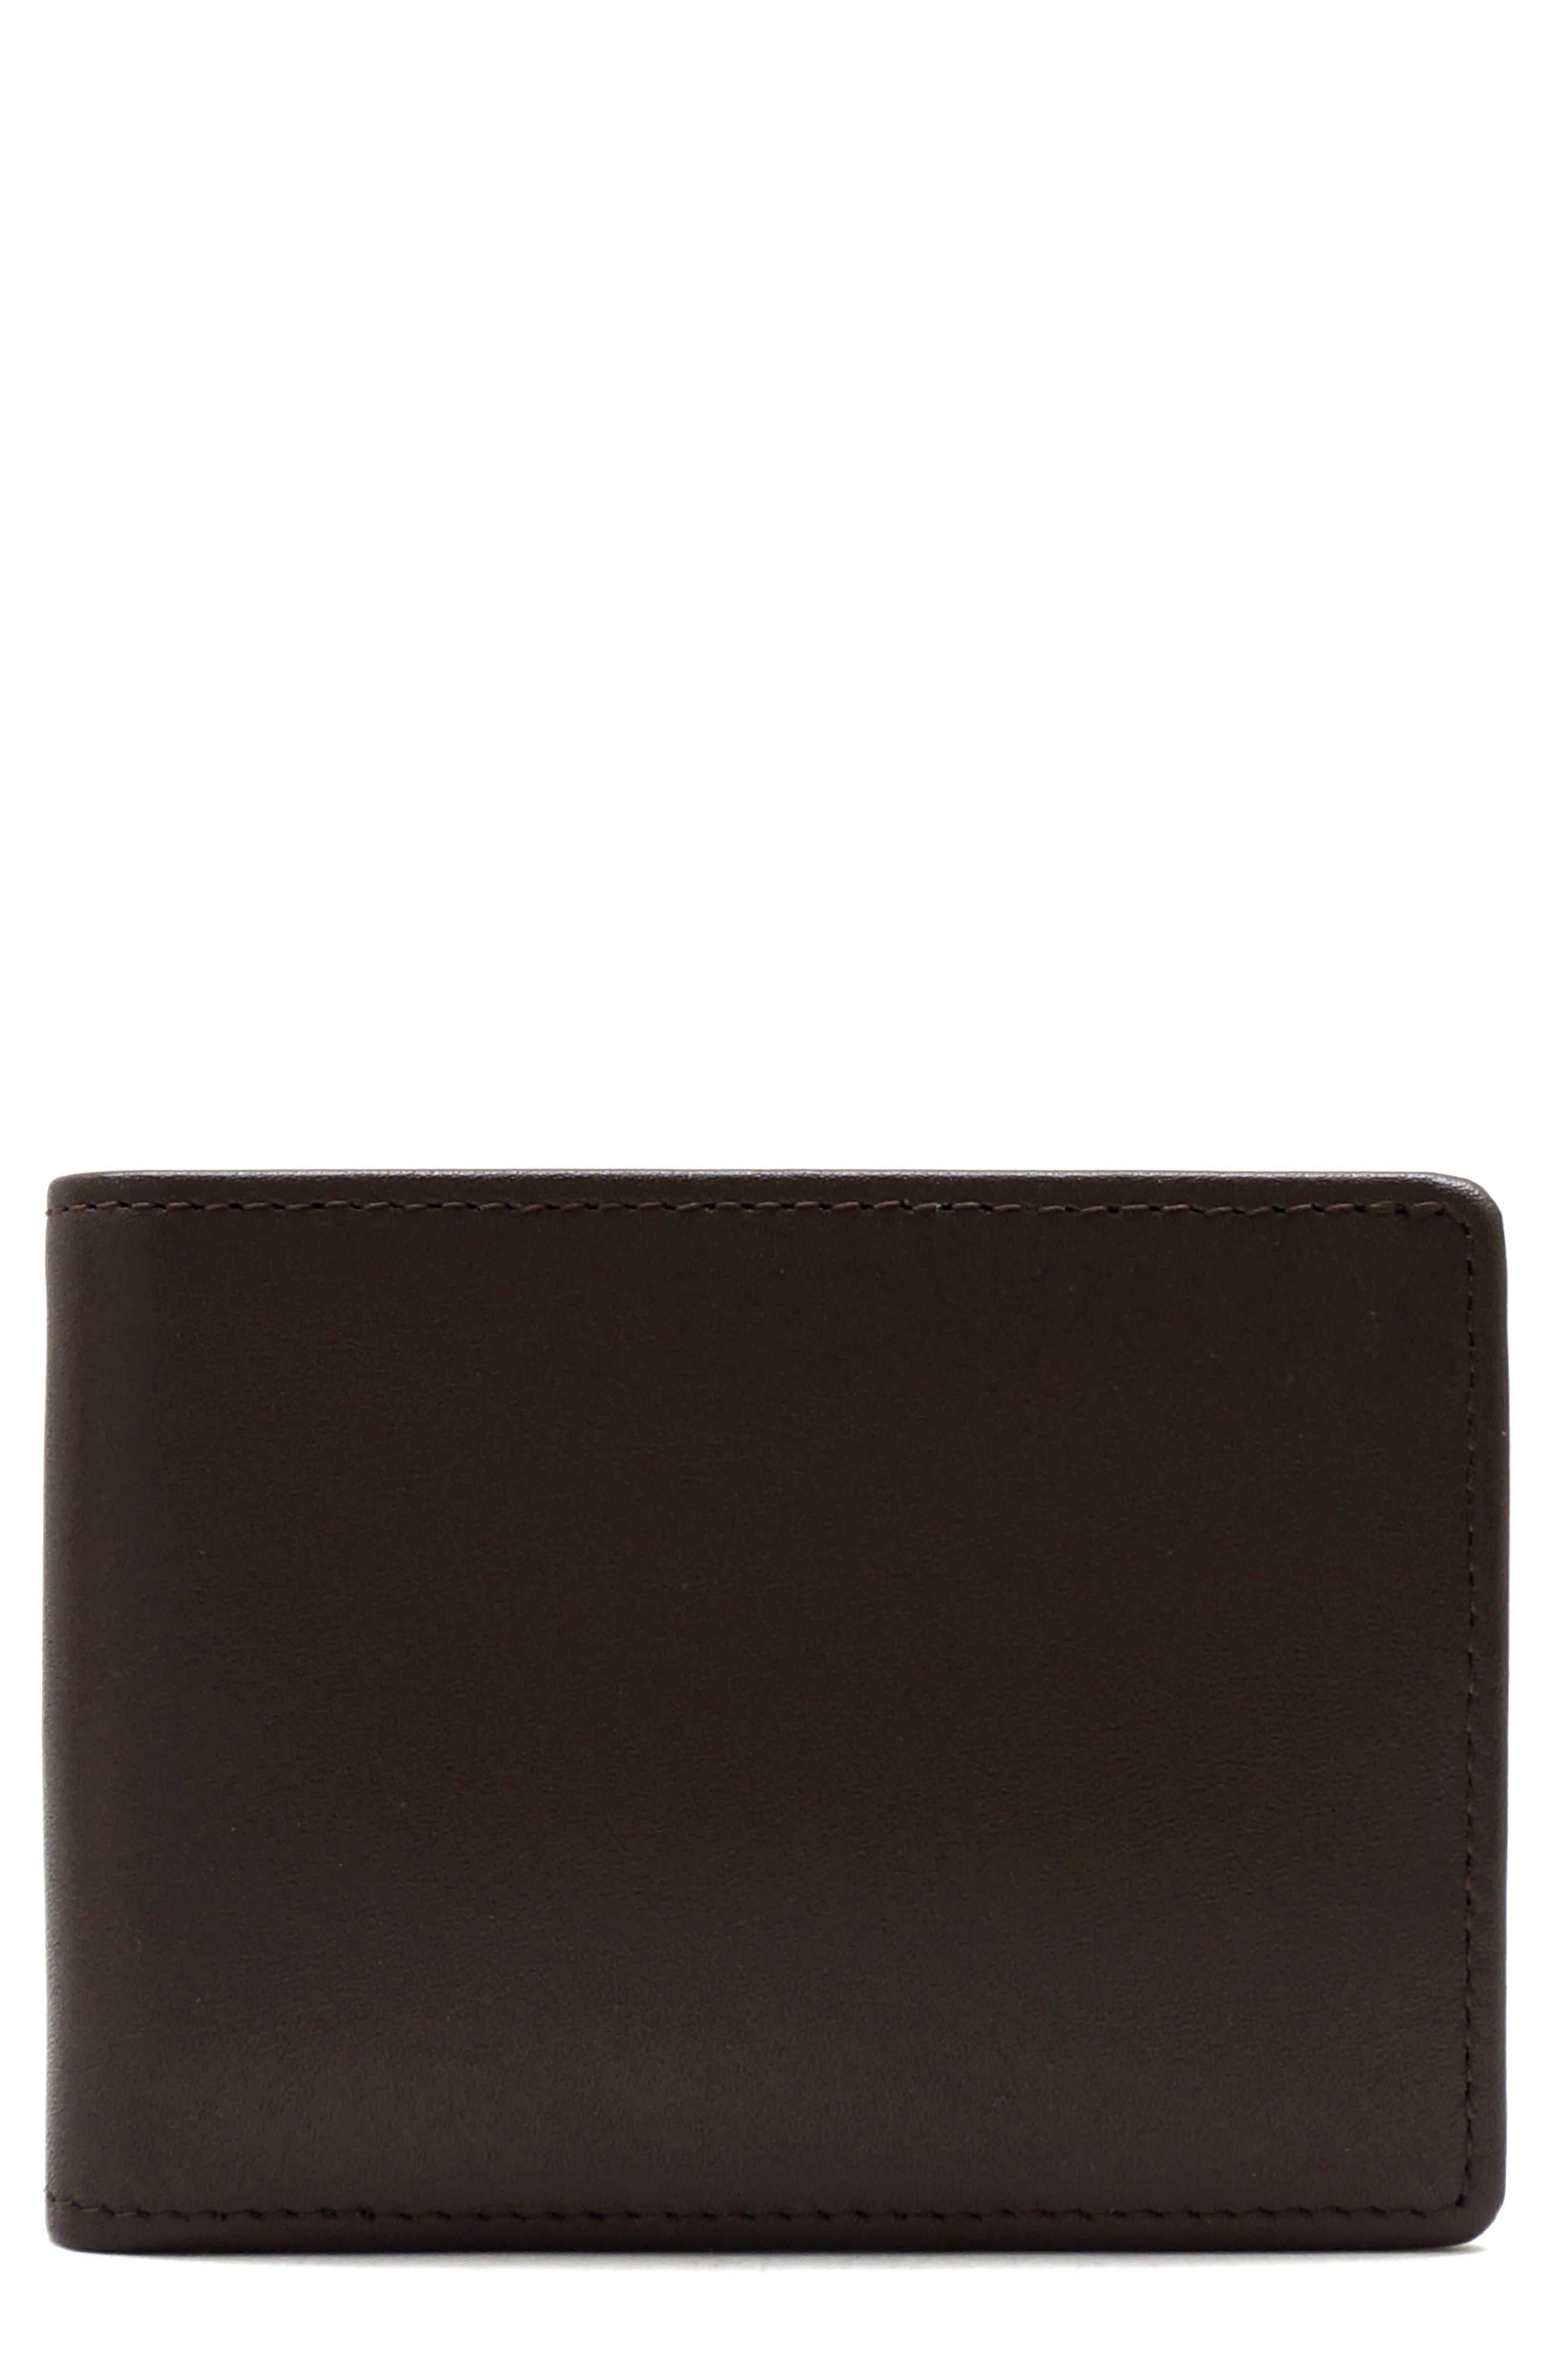 Grant Slimster Leather Wallet